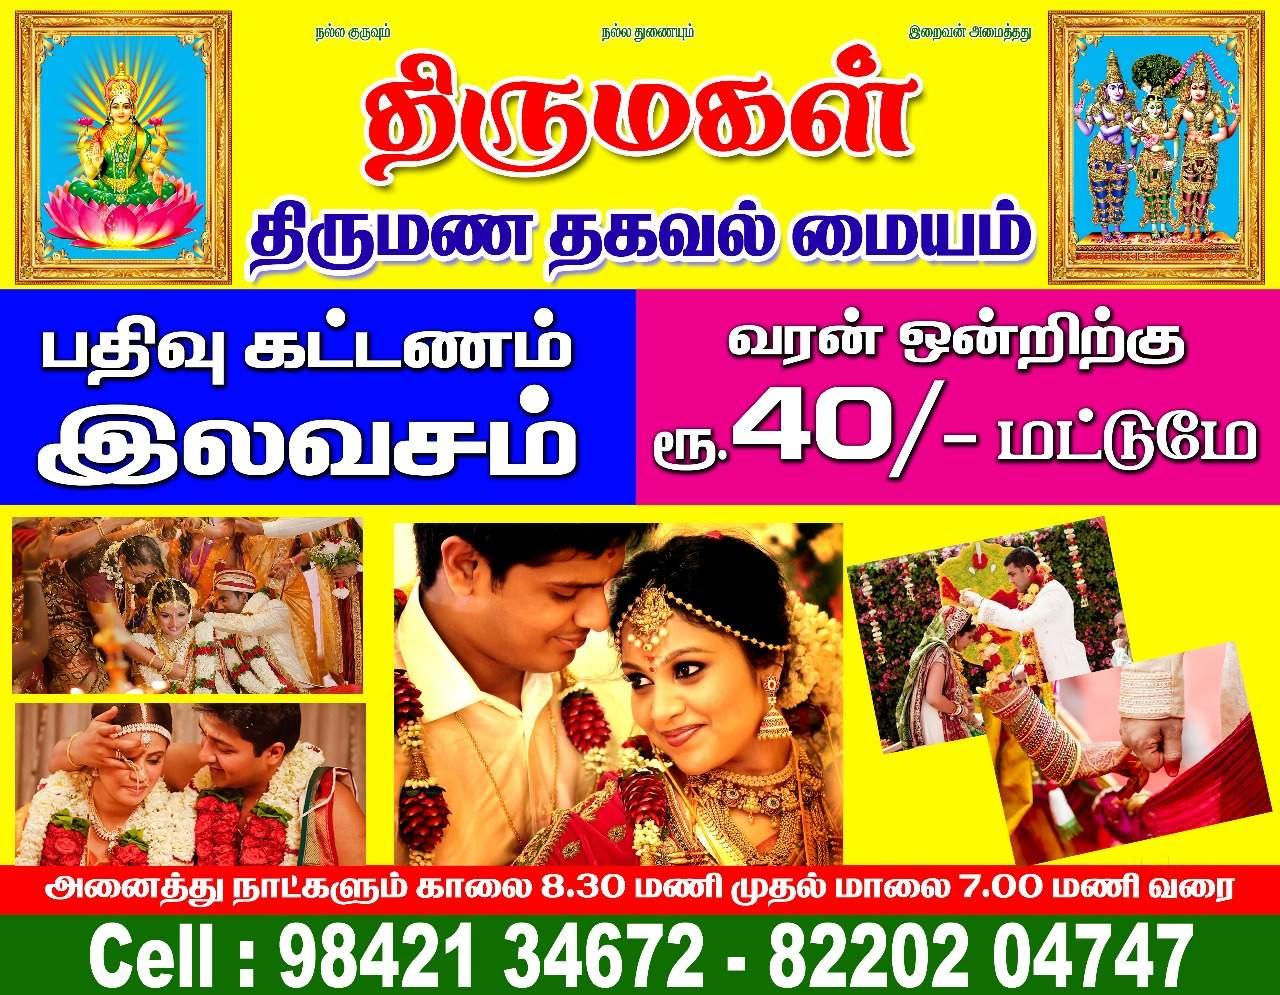 Top 100 Marriage Bureau in Madurai - Best Tamil Matrimony - Justdial